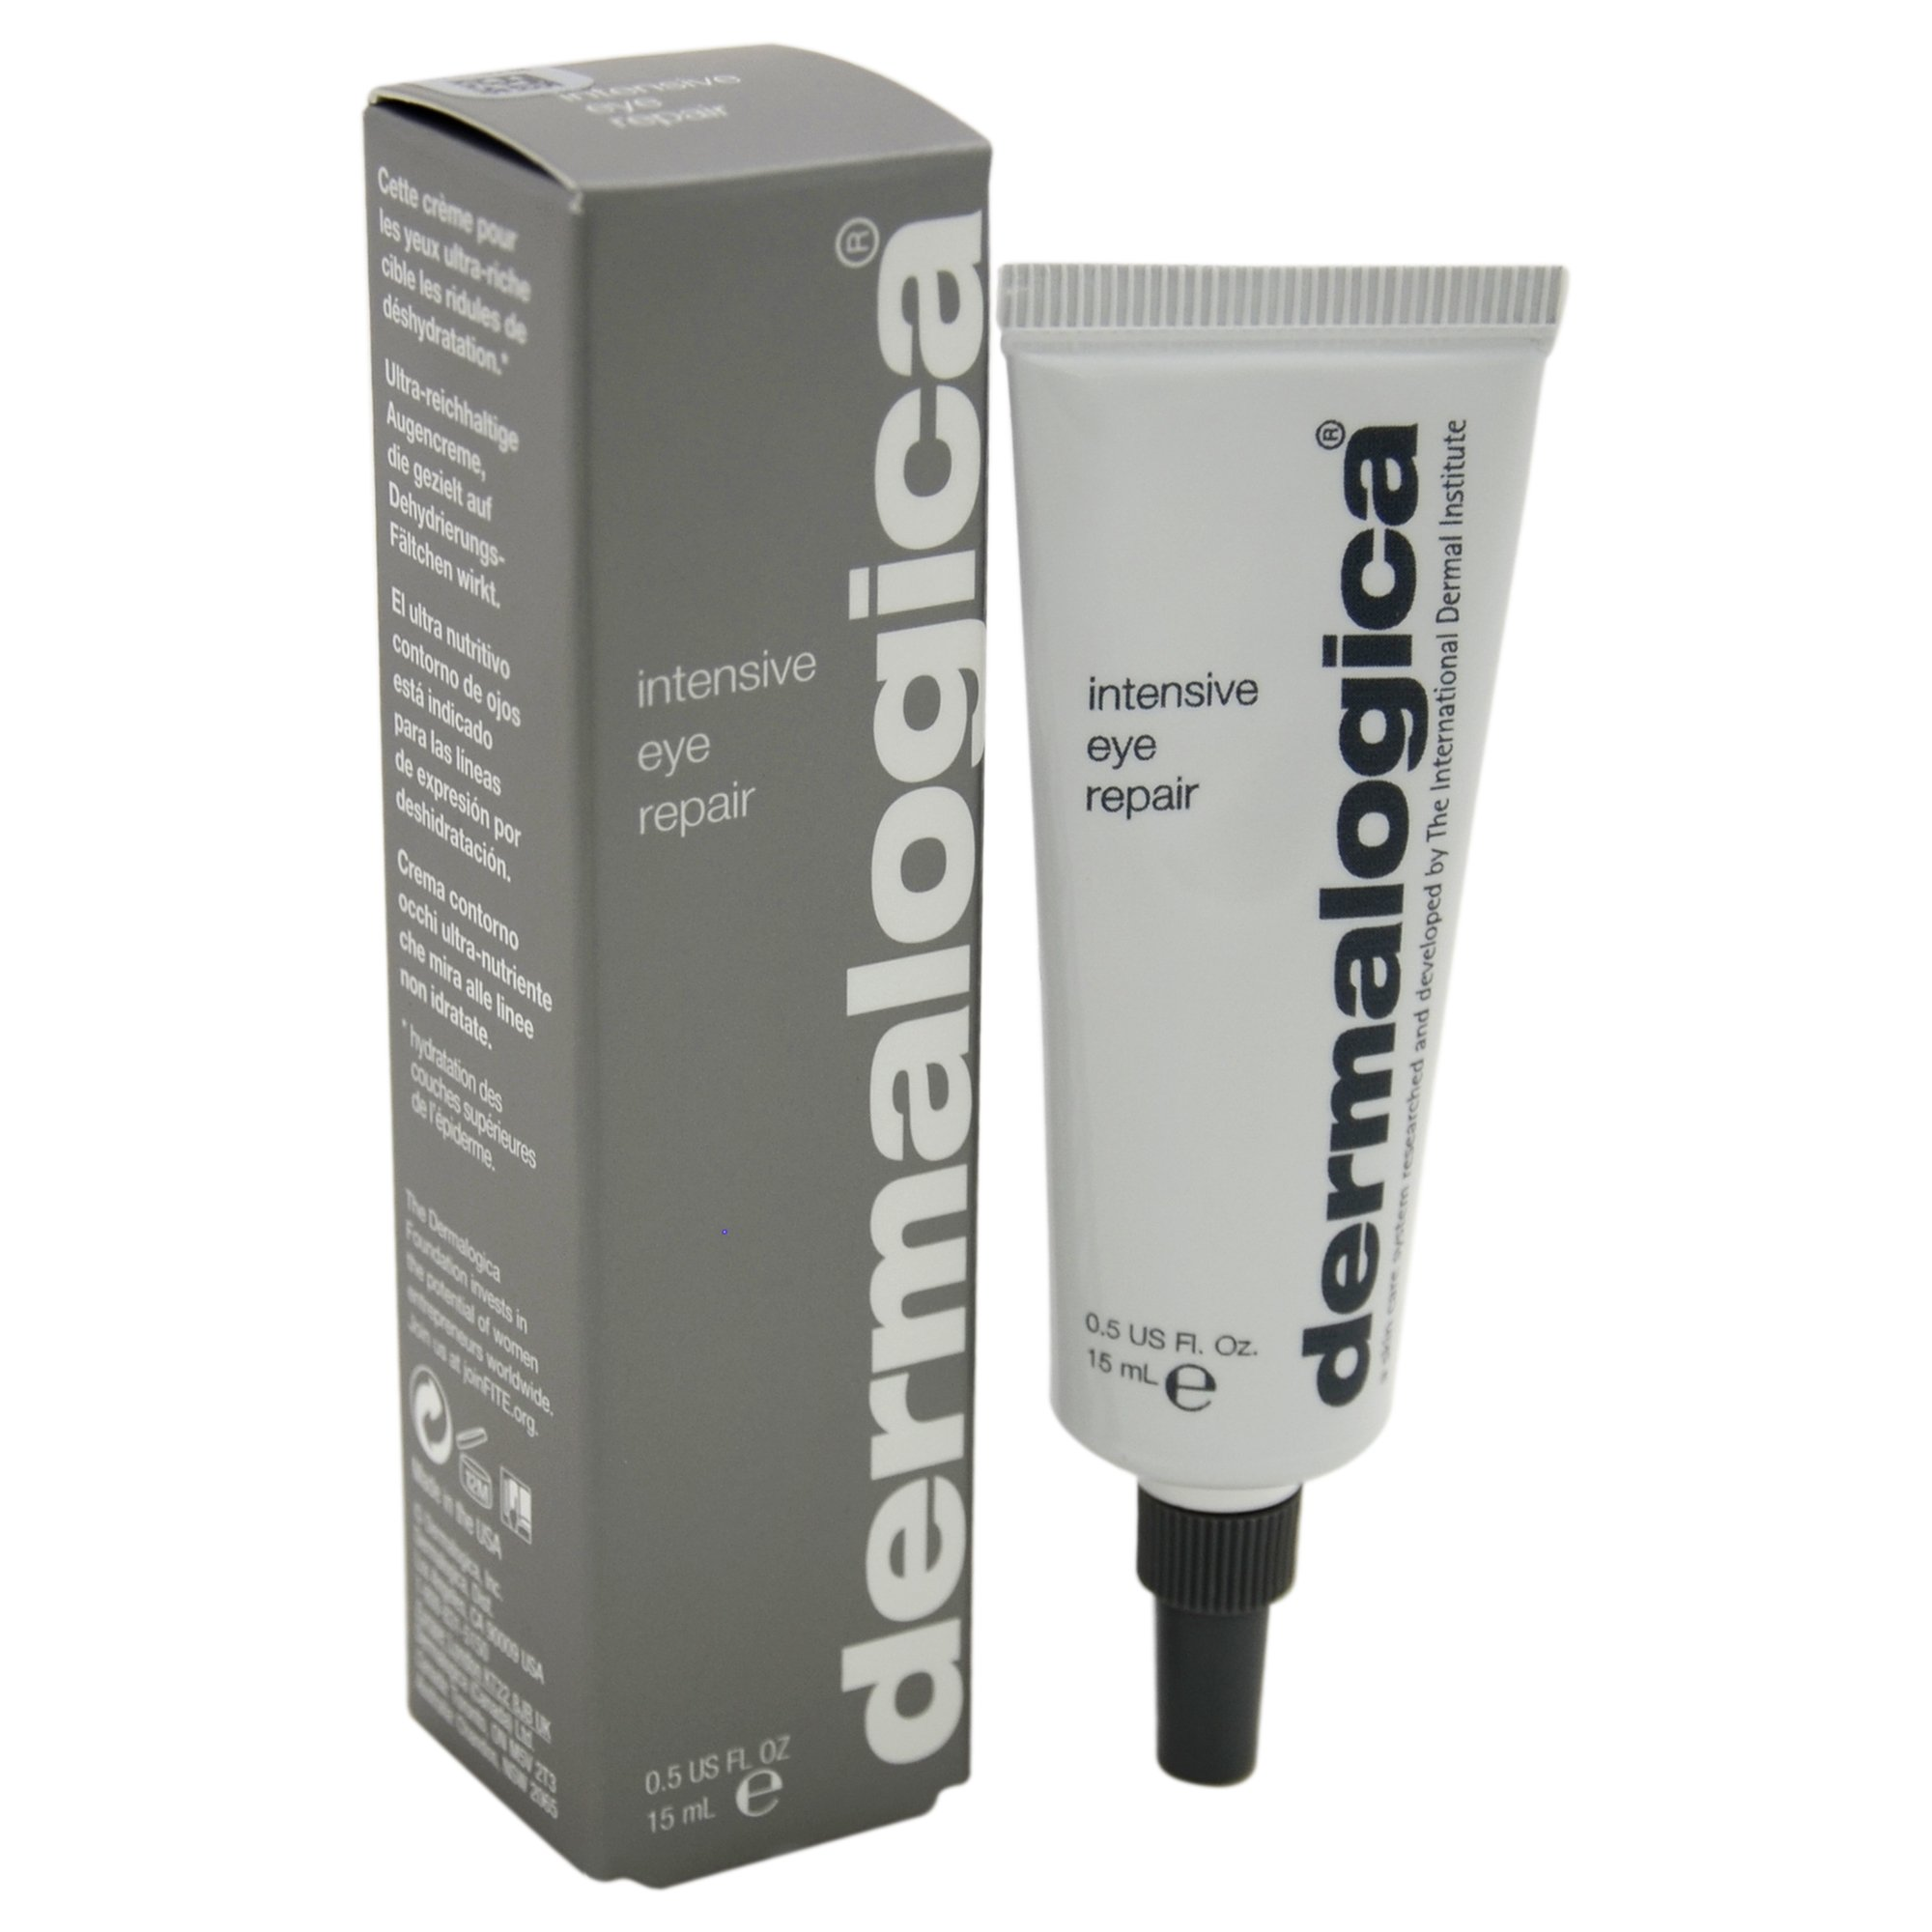 Amazon.com : Dermalogica Multivitamin Hand and Nail Treatment 2.5 oz ...